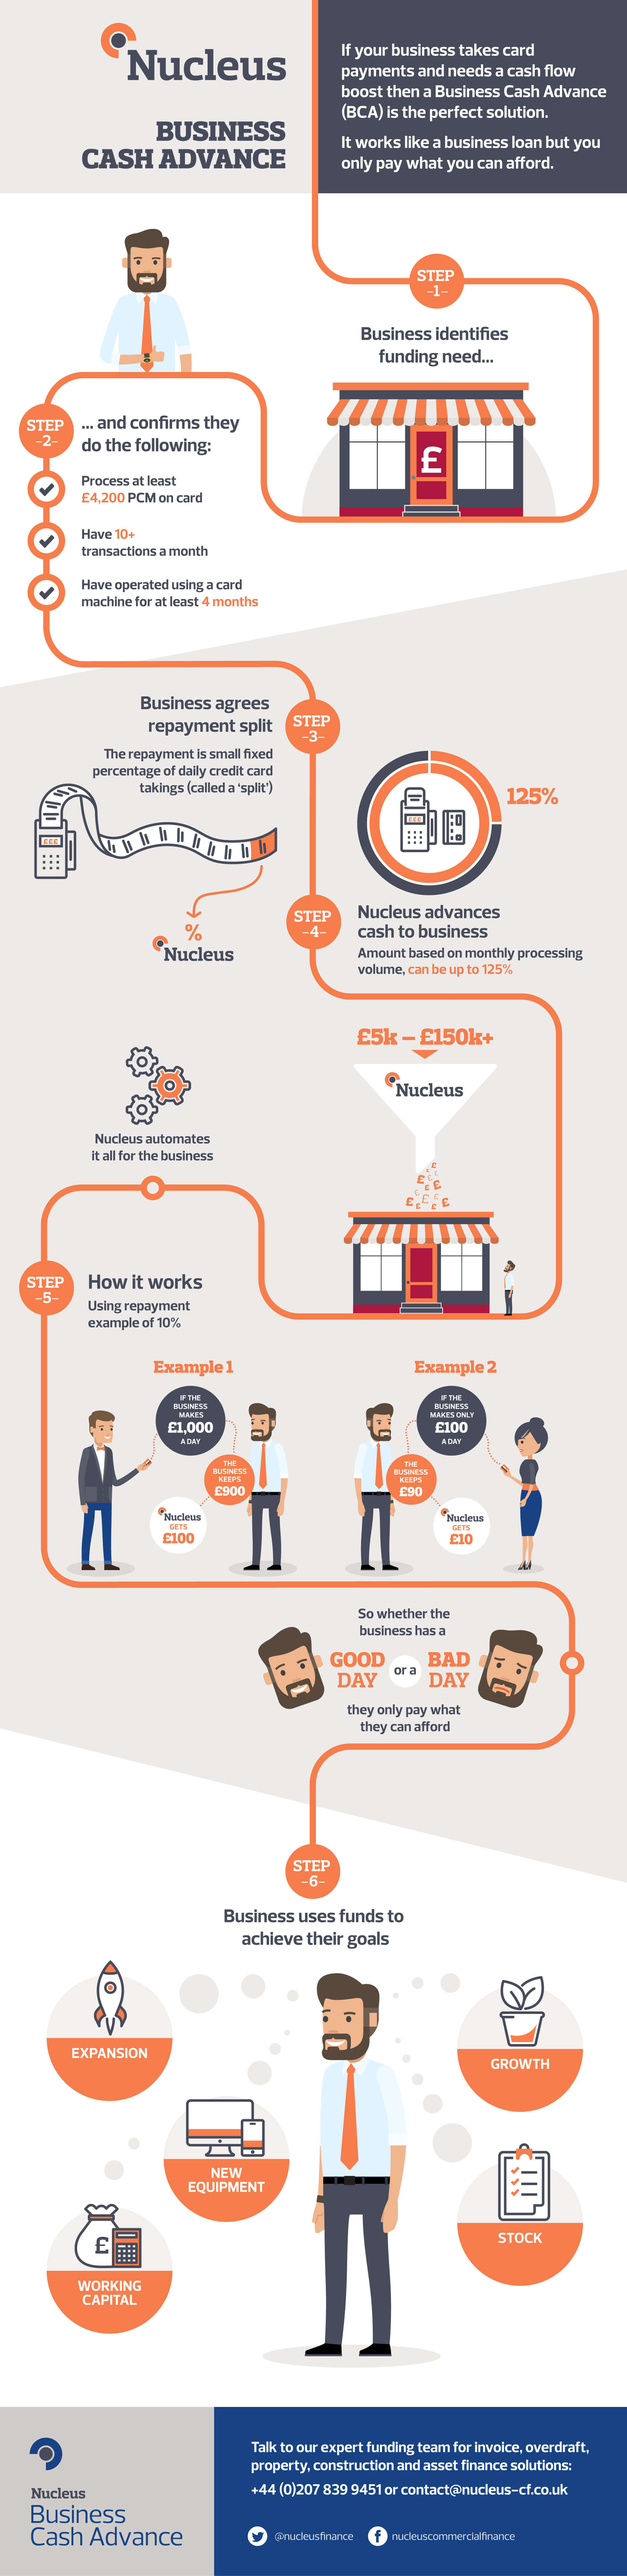 Business-Cash-Advance-infographic_v8.jpg